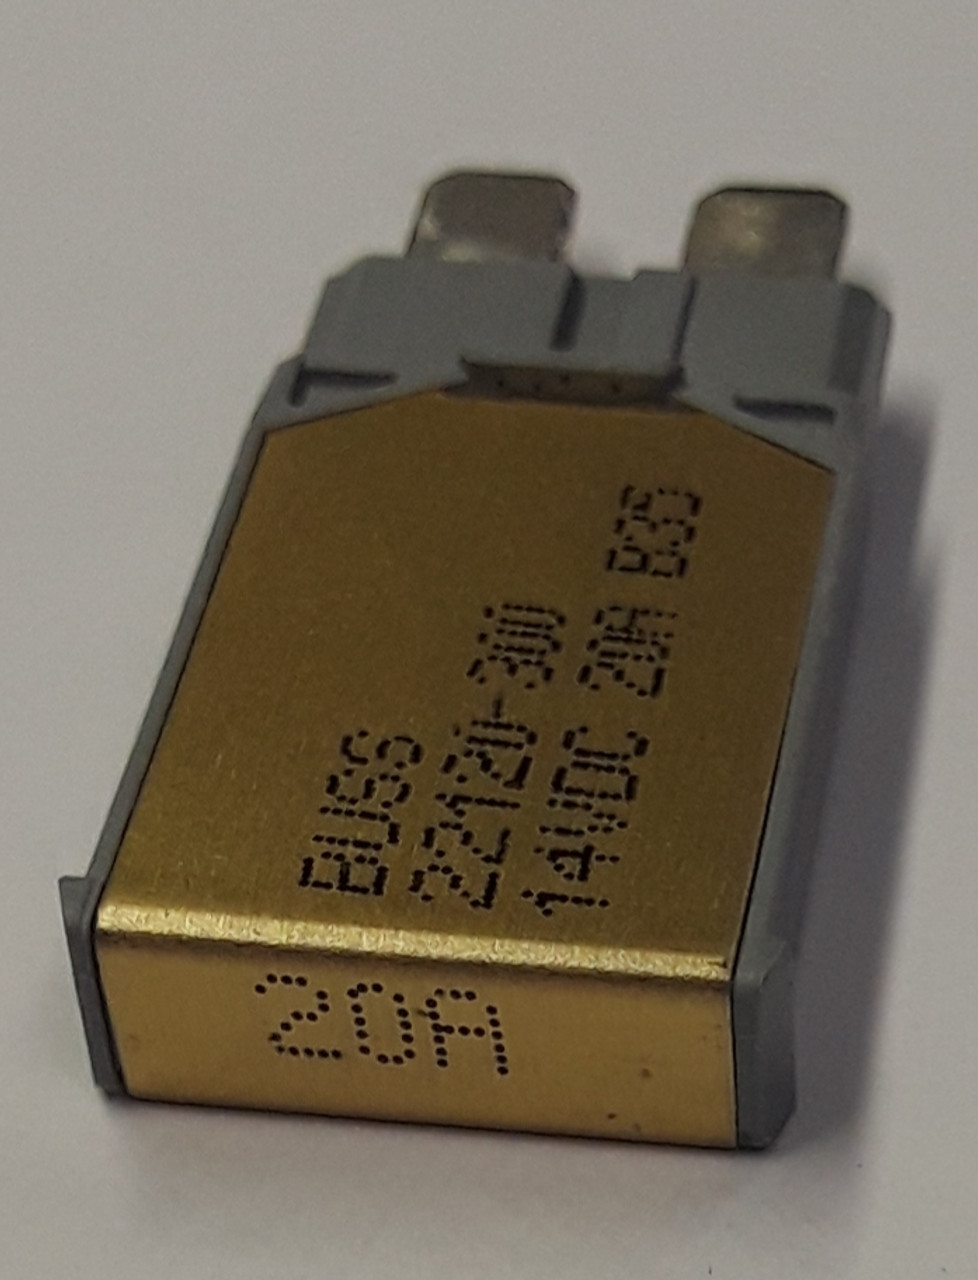 hight resolution of 22120 300 cooper bussmann 20 amp mini circuit breaker with atc 22120 300 cooper bussmann type